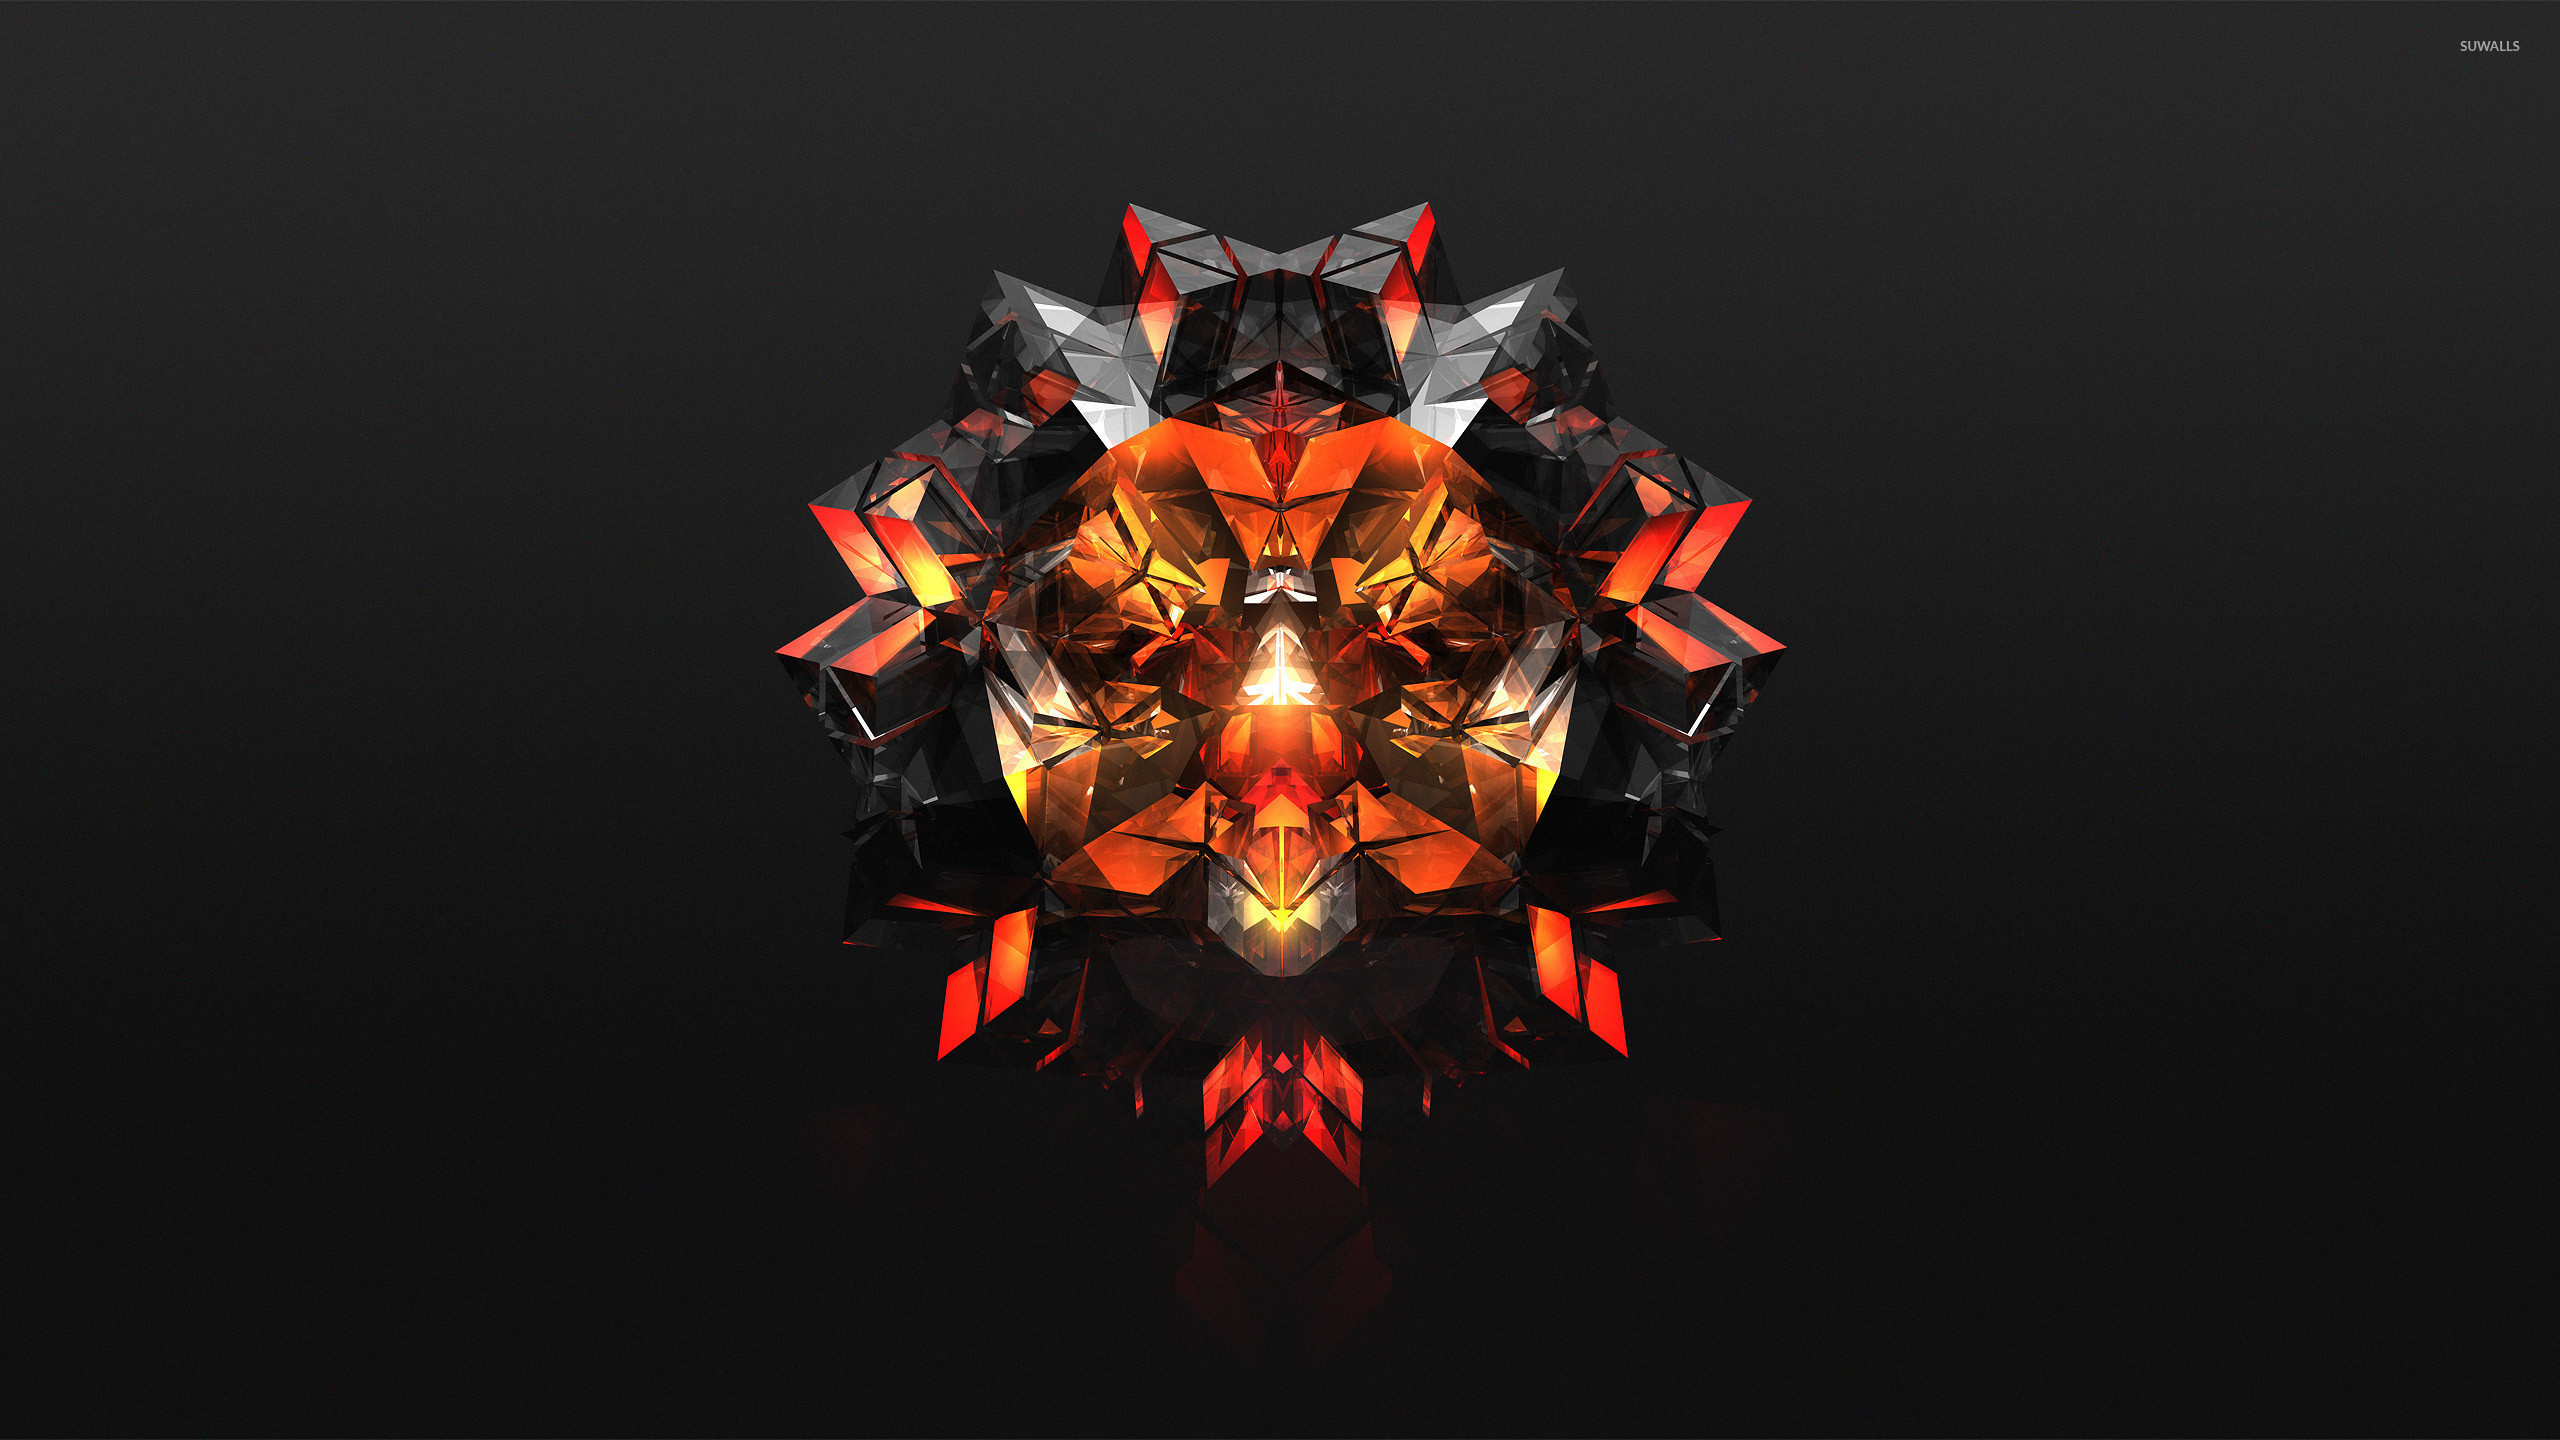 Black and orange diamond wallpaper jpg